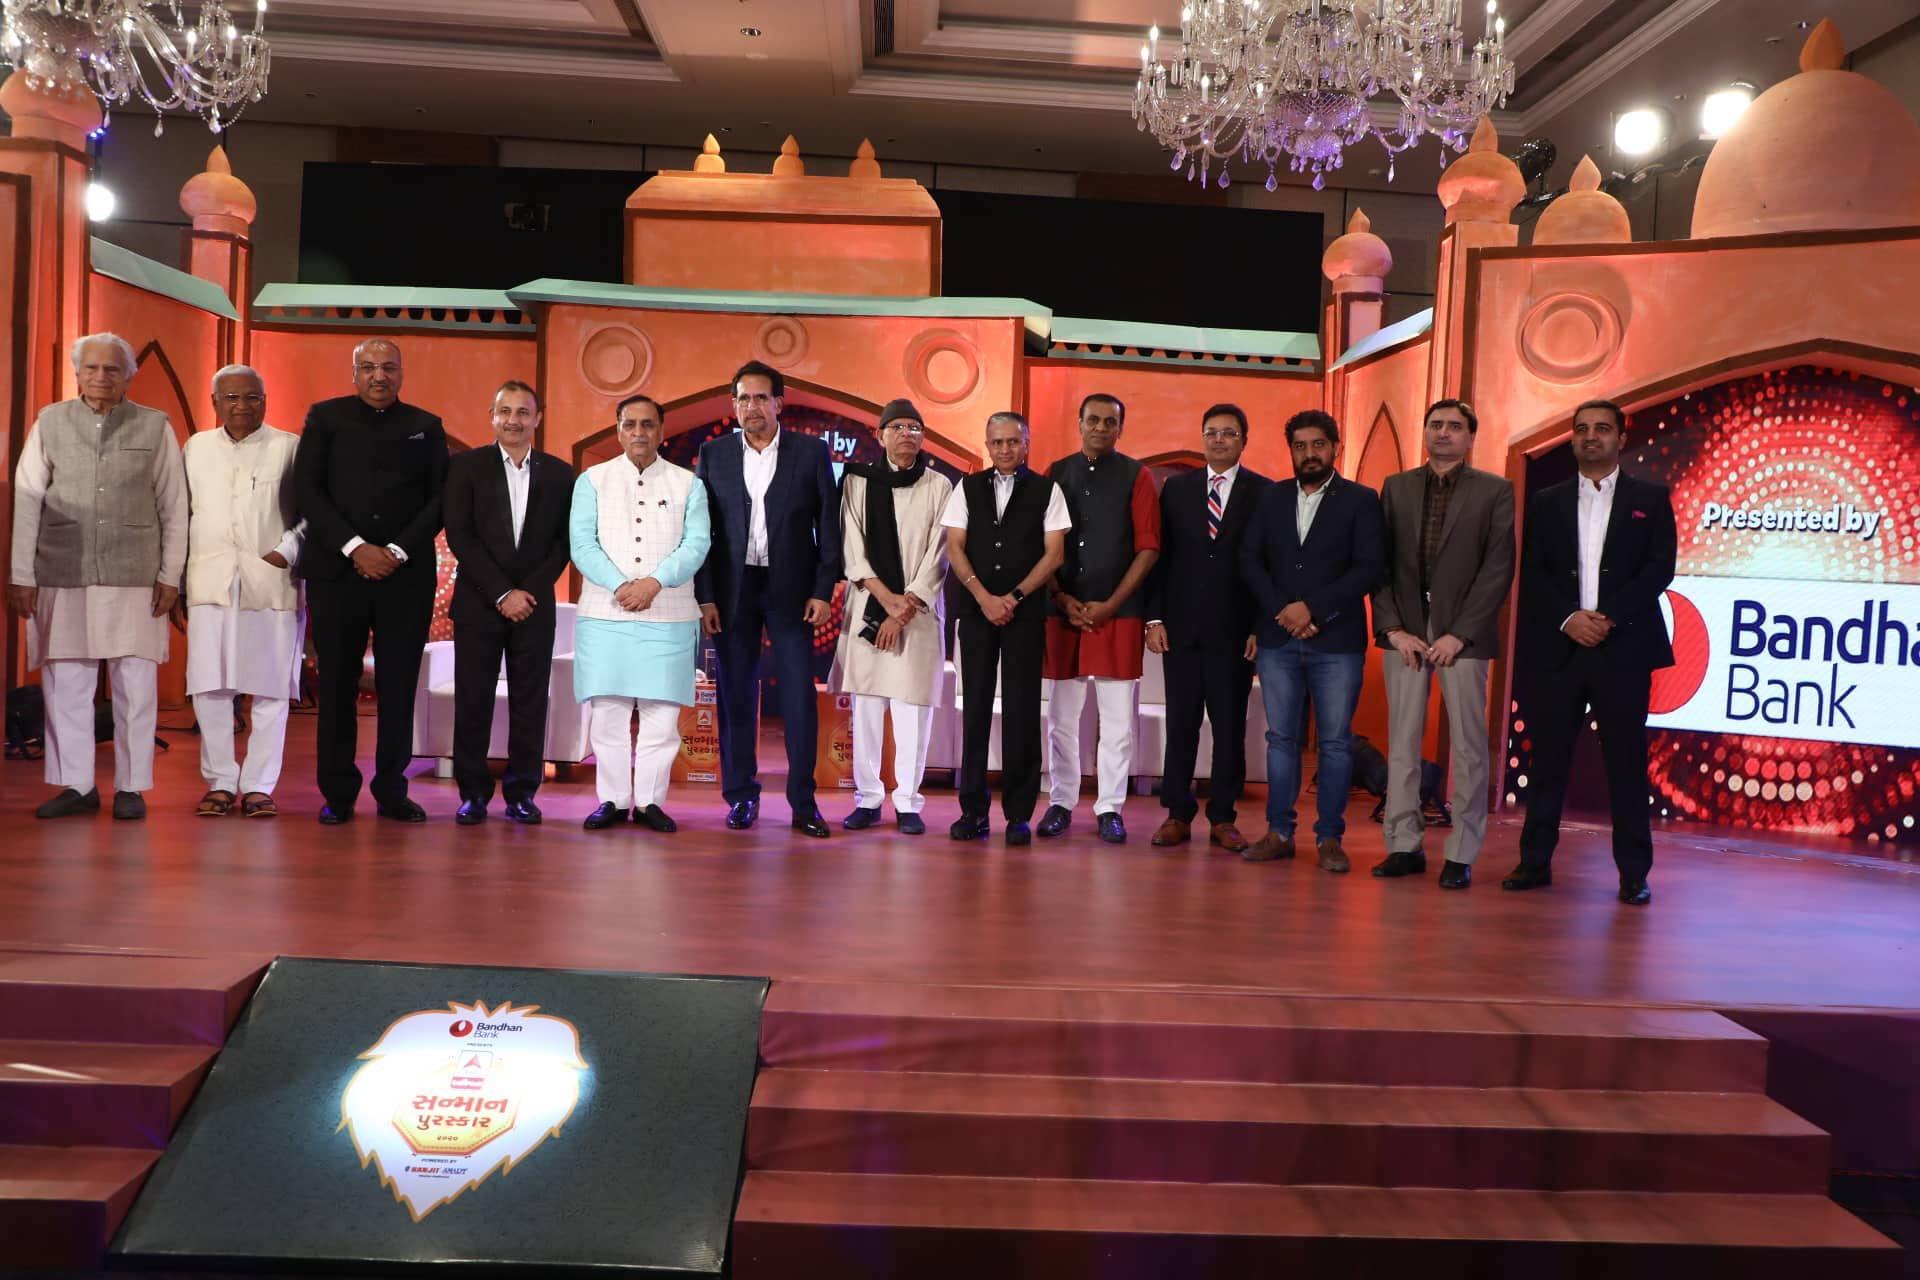 Donate Life Founder and President Nilesh Mandlewala was felicitated by ABP Asmita with Ashmita Sanman Purashkar 2020 by hands of CM Vijaybhai Rupani.